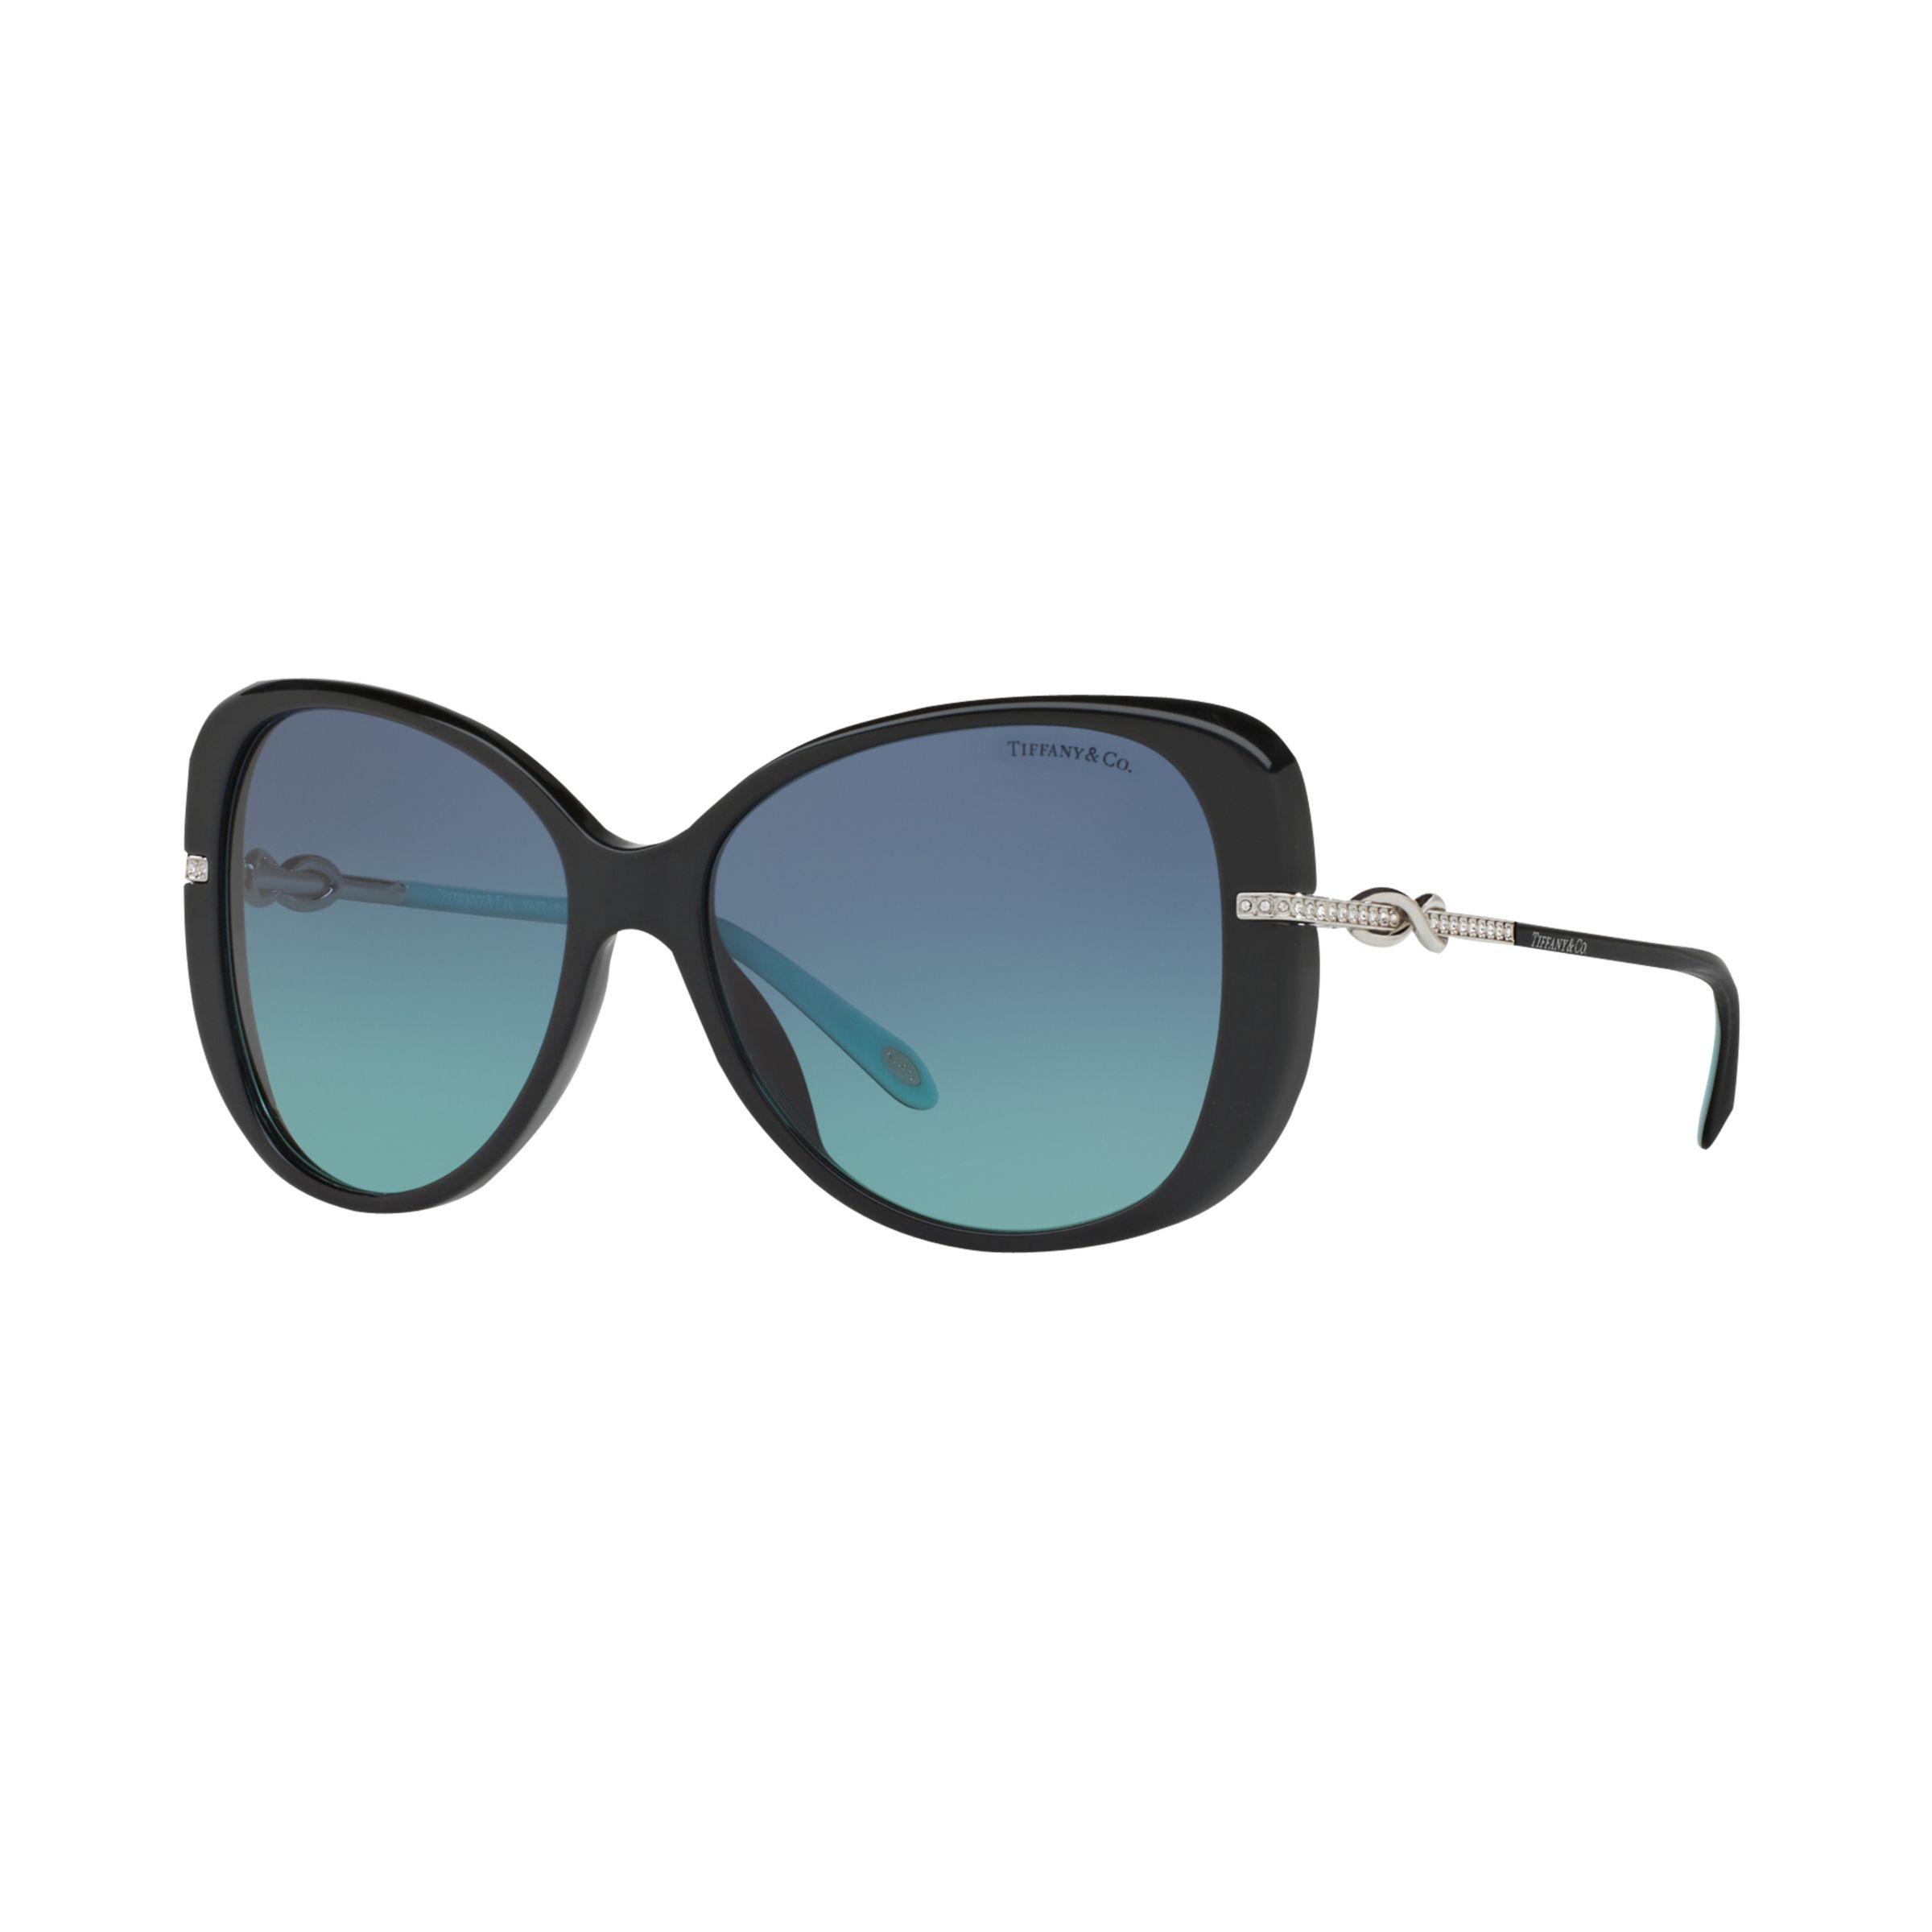 Tiffany & Co Tiffany & Co TF4126B Embellished Cat's Eye Sunglasses, Black/Blue Gradient